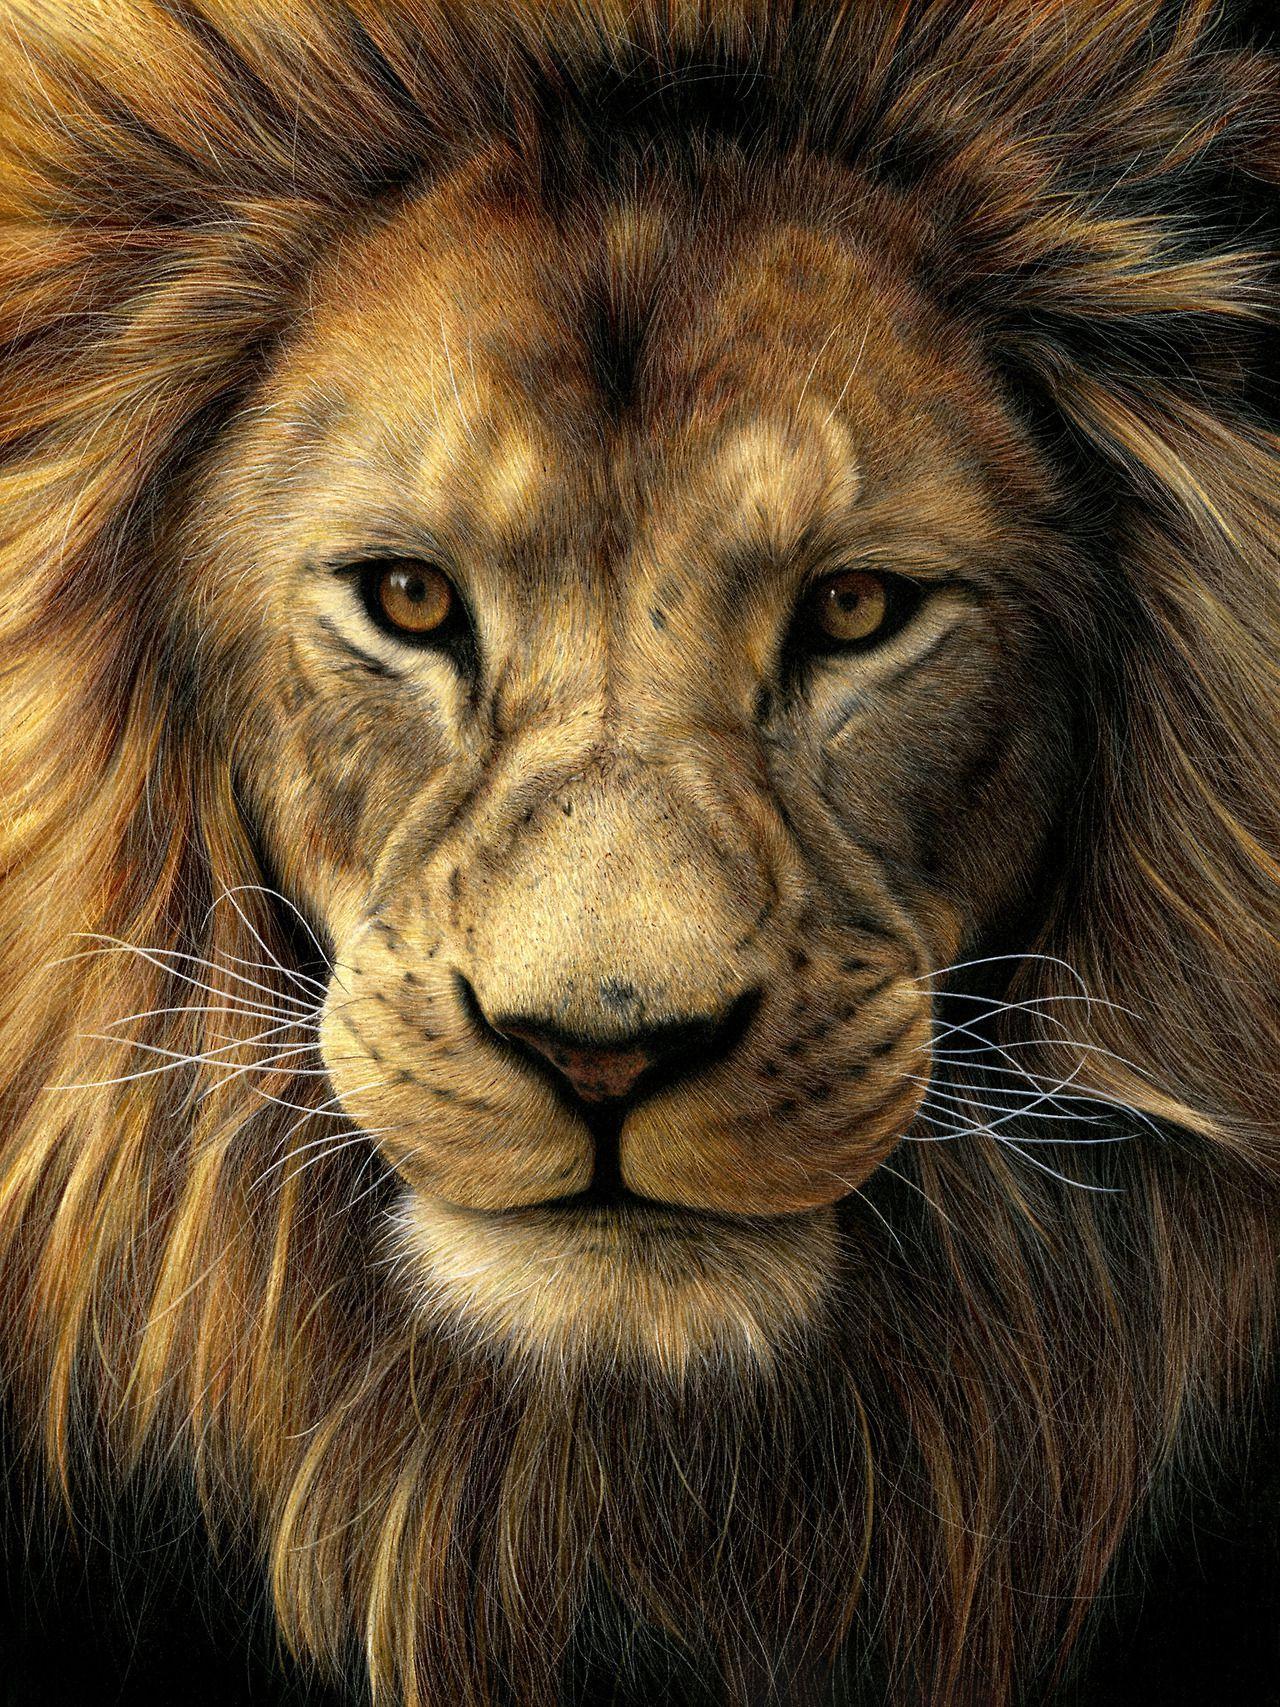 Lion Drawing Color : drawing, color, Drawing, Colored, Pencil, Drawing,, Realistic, Drawings,